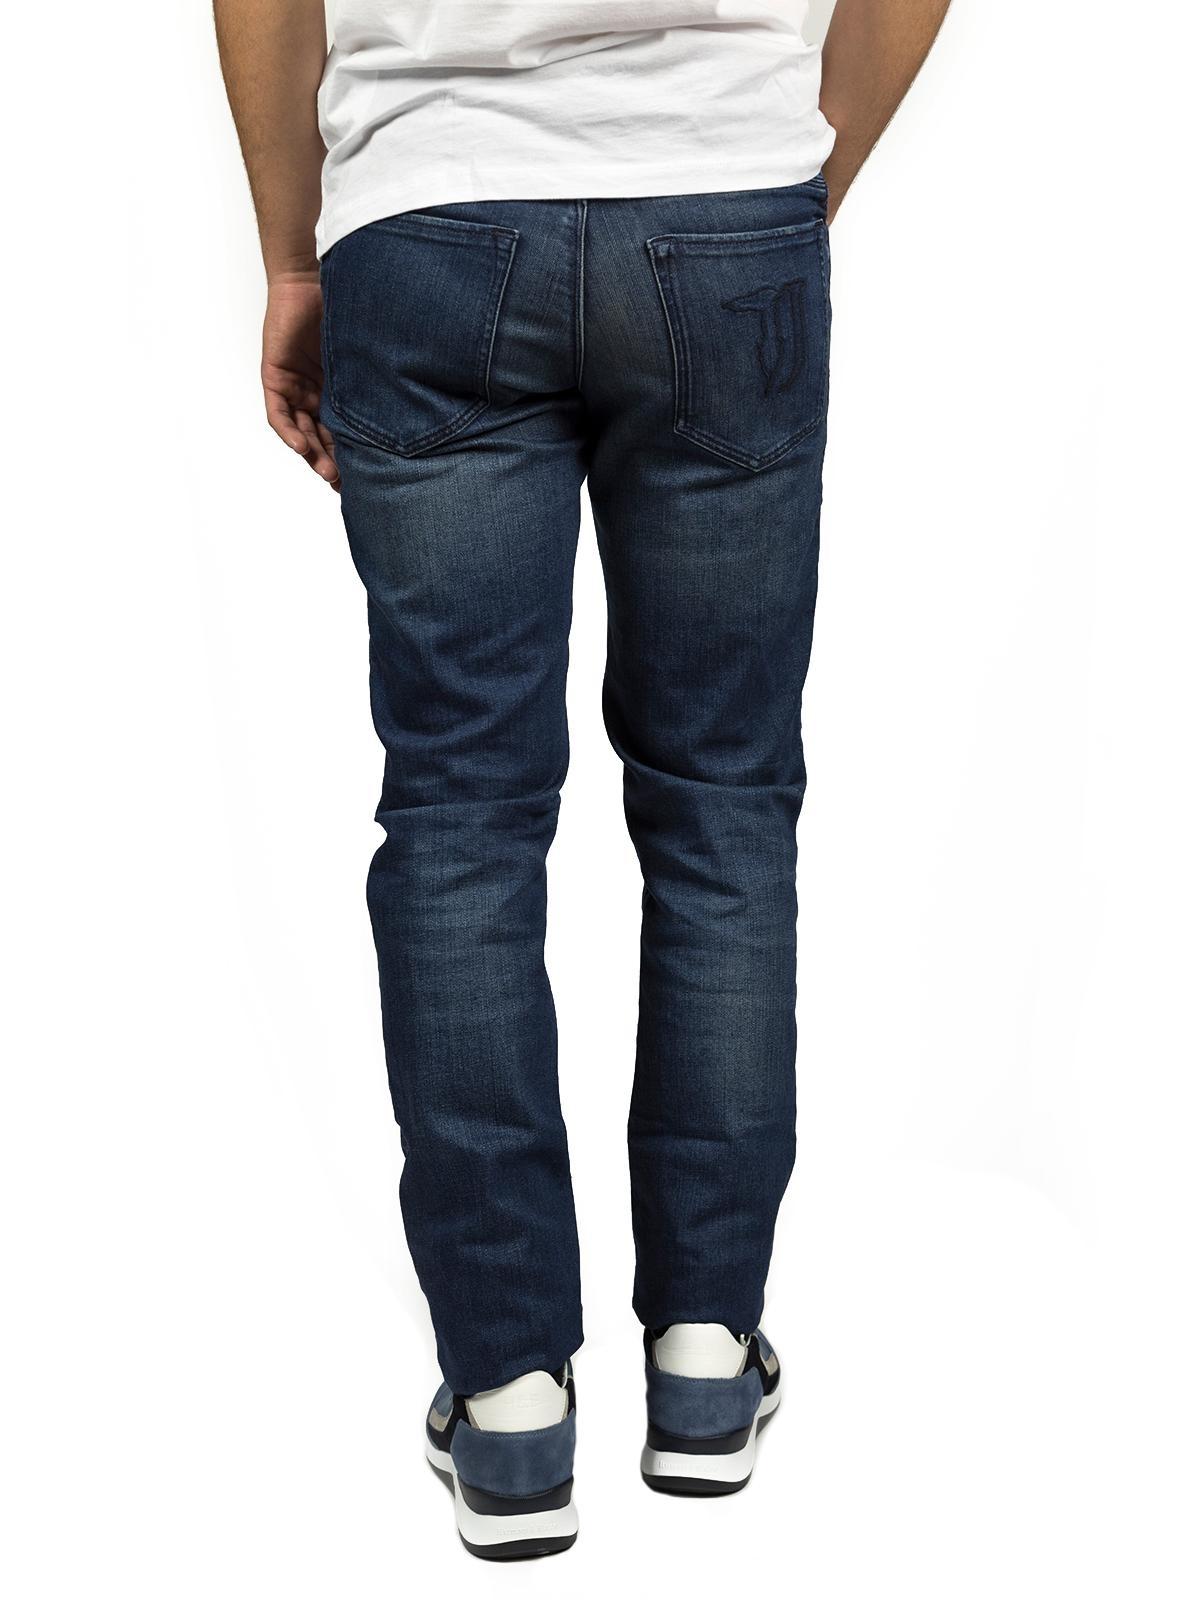 Trussardi Jeans 52J00000 1Y090525